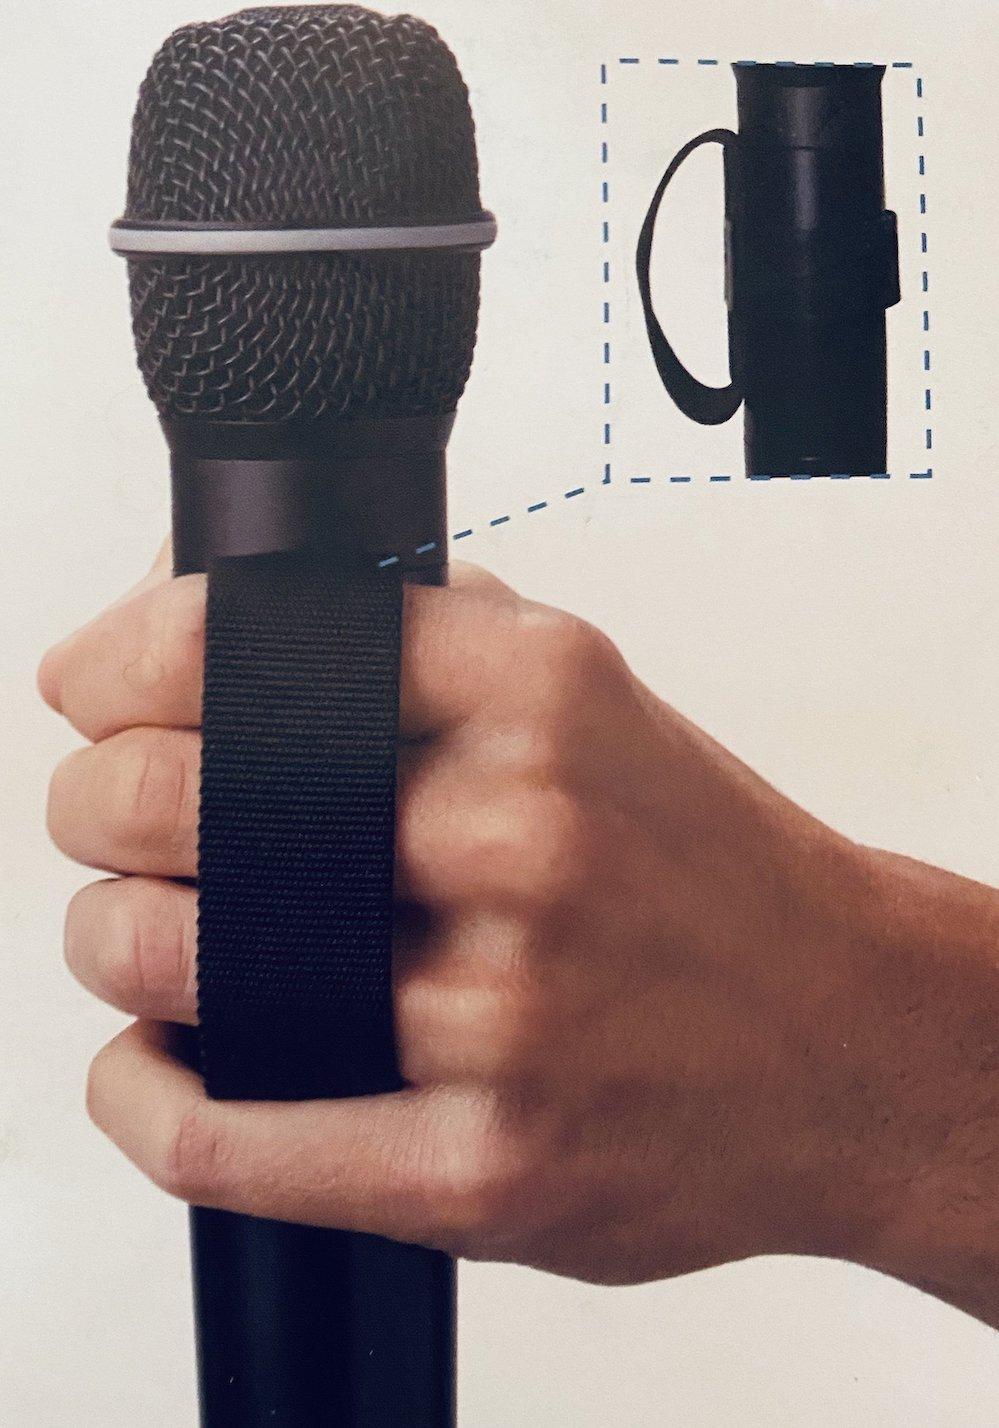 lanyao-mic-grip.jpeg